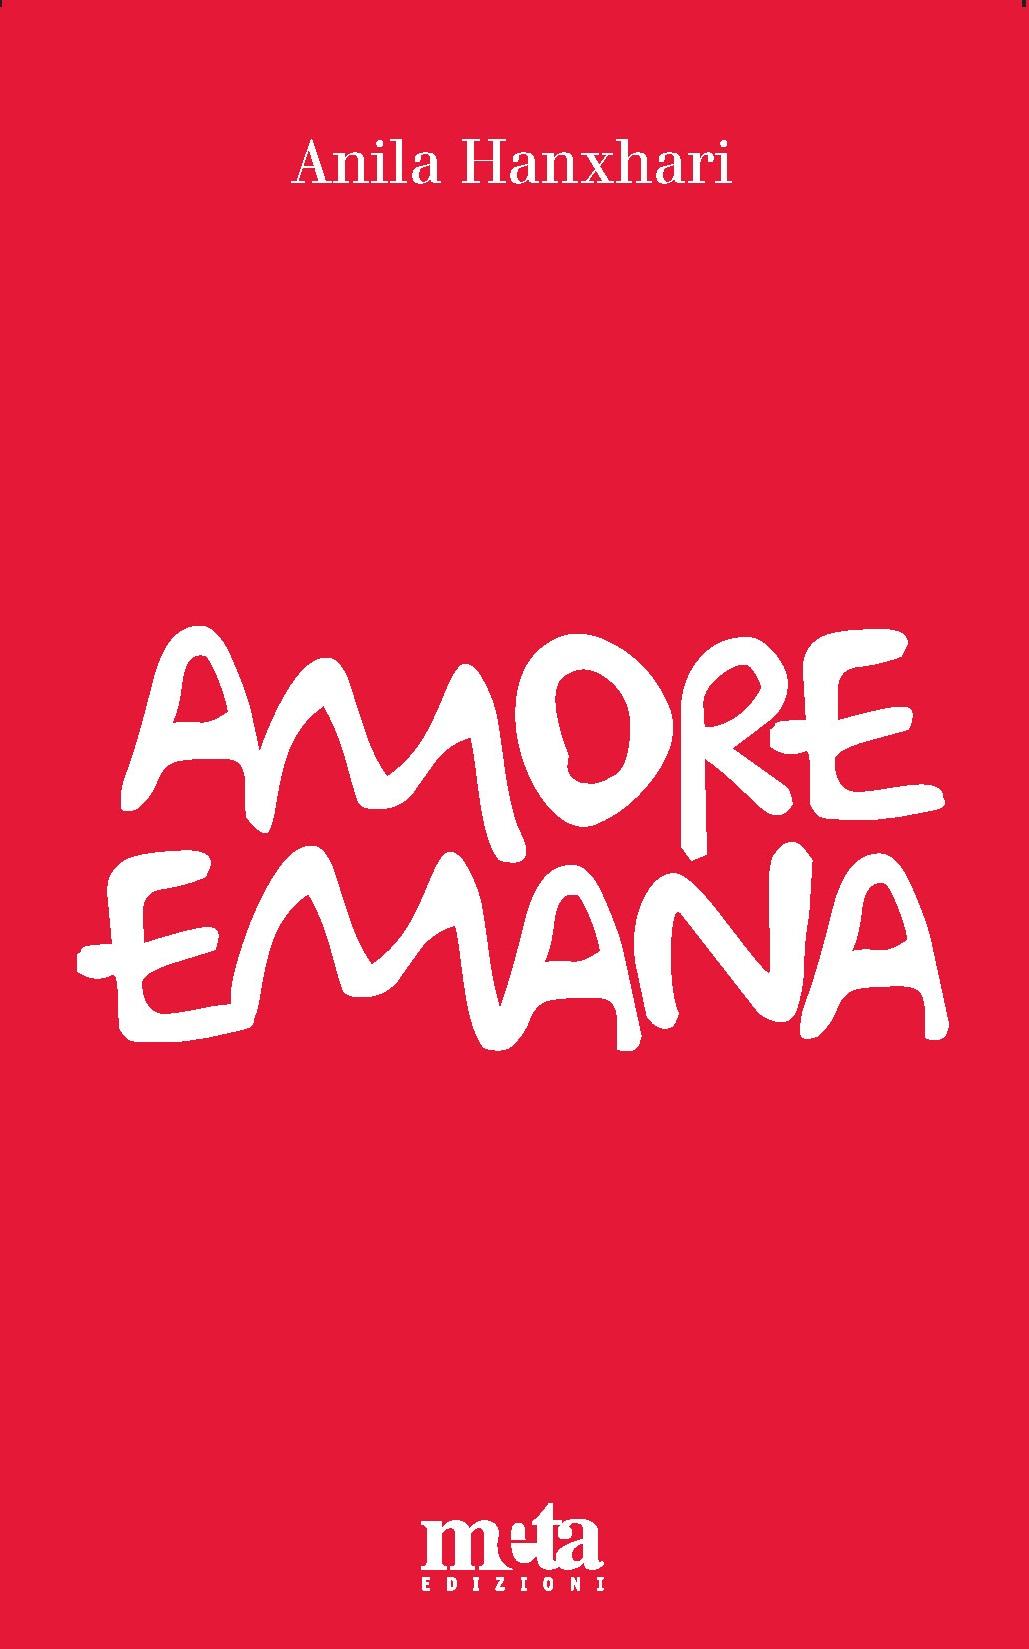 Amore Emana